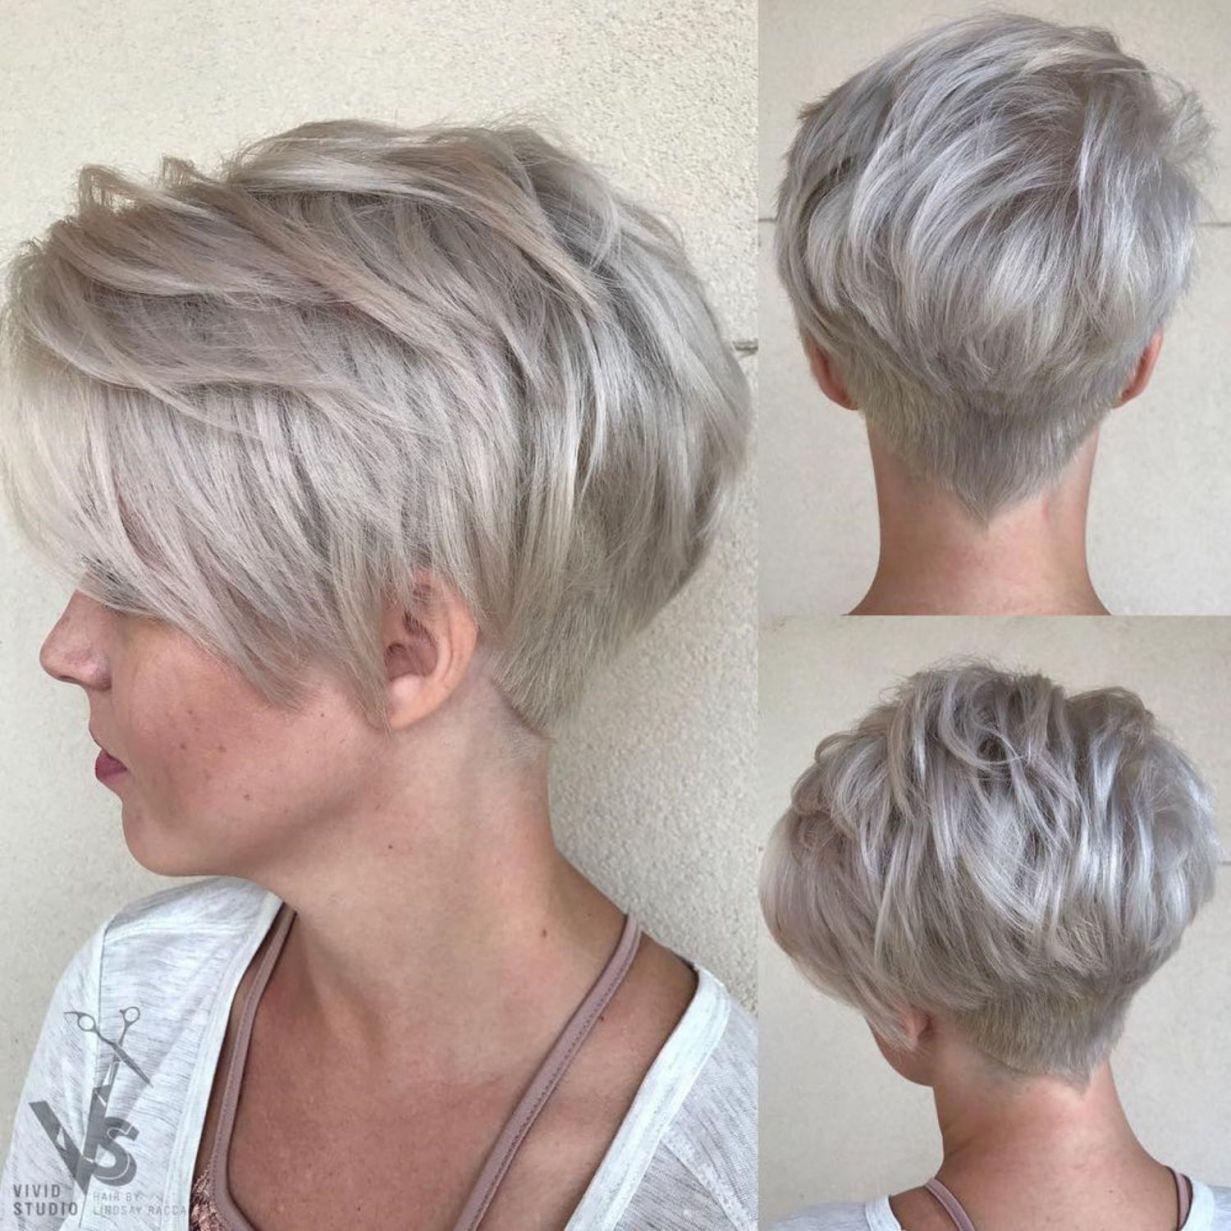 Short Shaggy Spiky Edgy Pixie Cuts and Hairstyles  hair hair